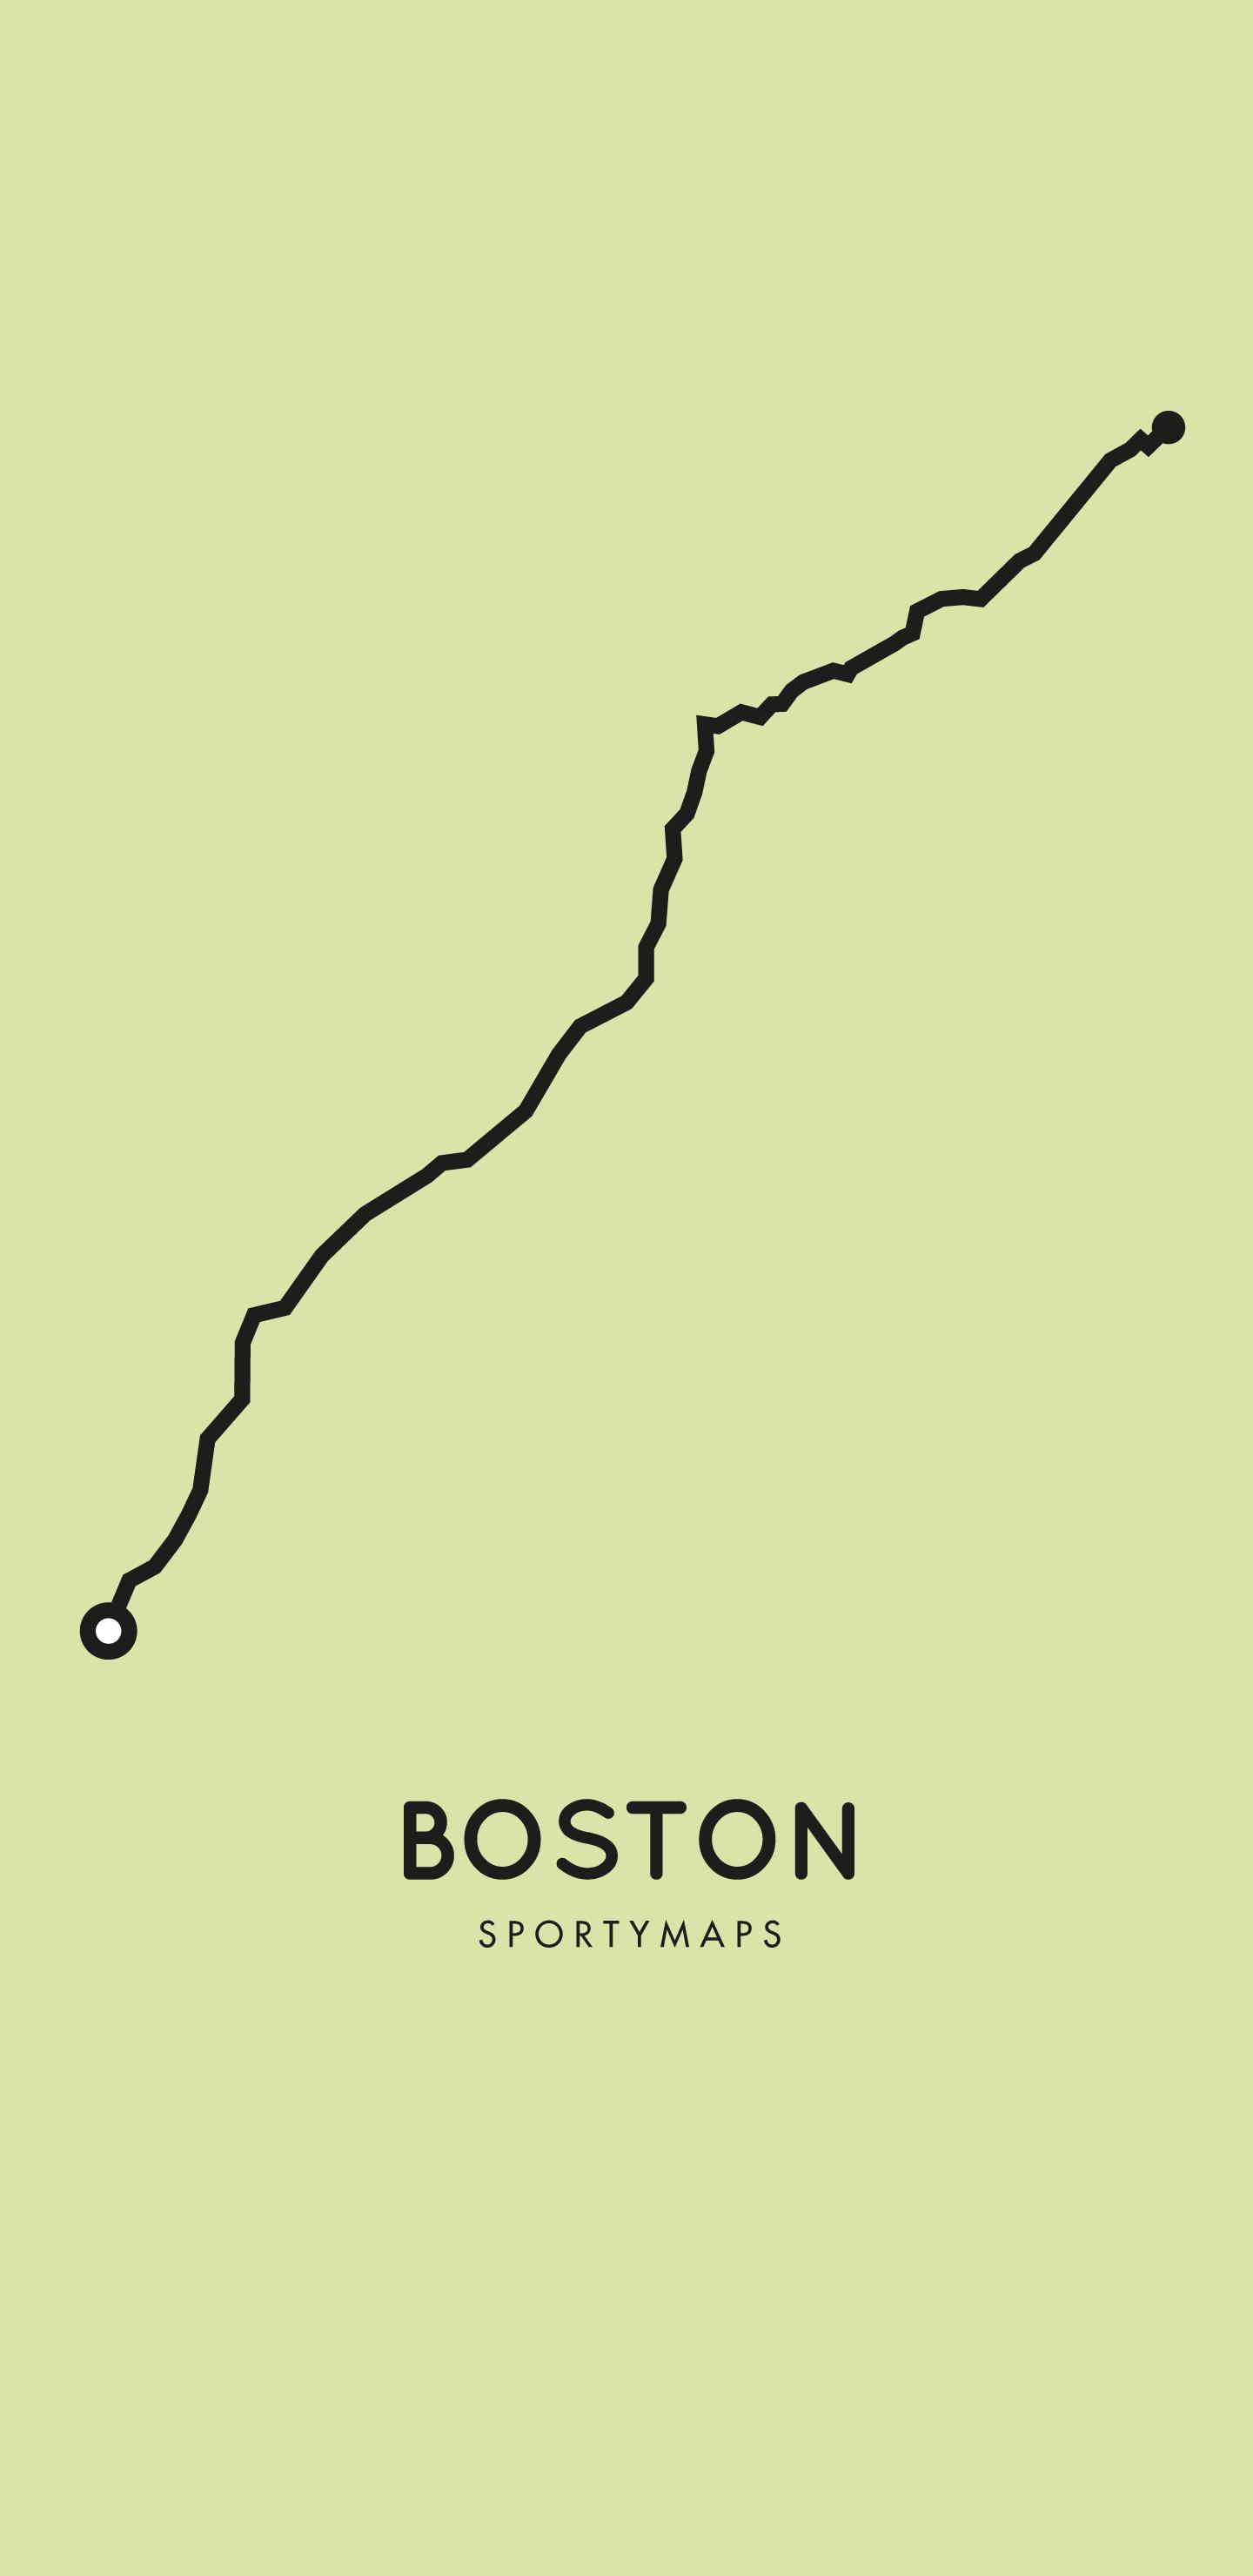 Sportymaps-Boston-marathon-green